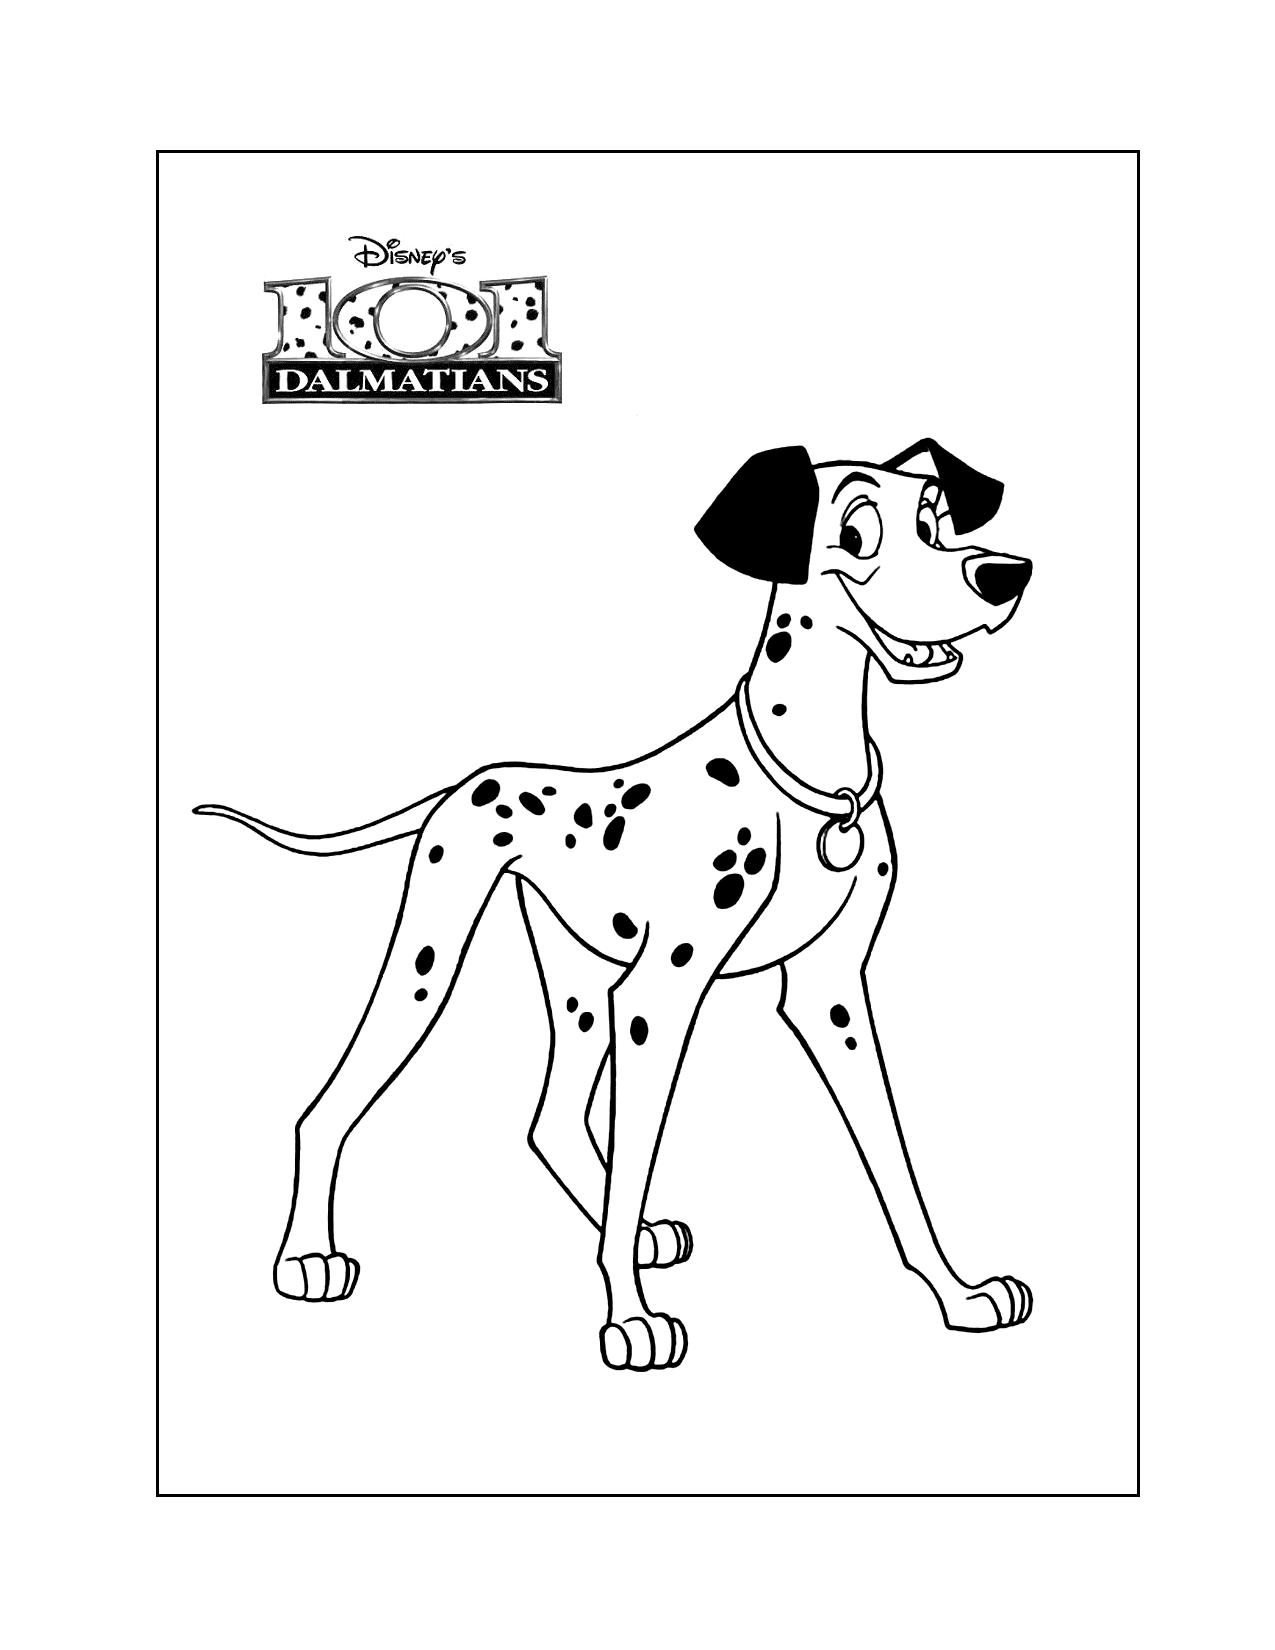 Pongo Dalmation Coloring Page